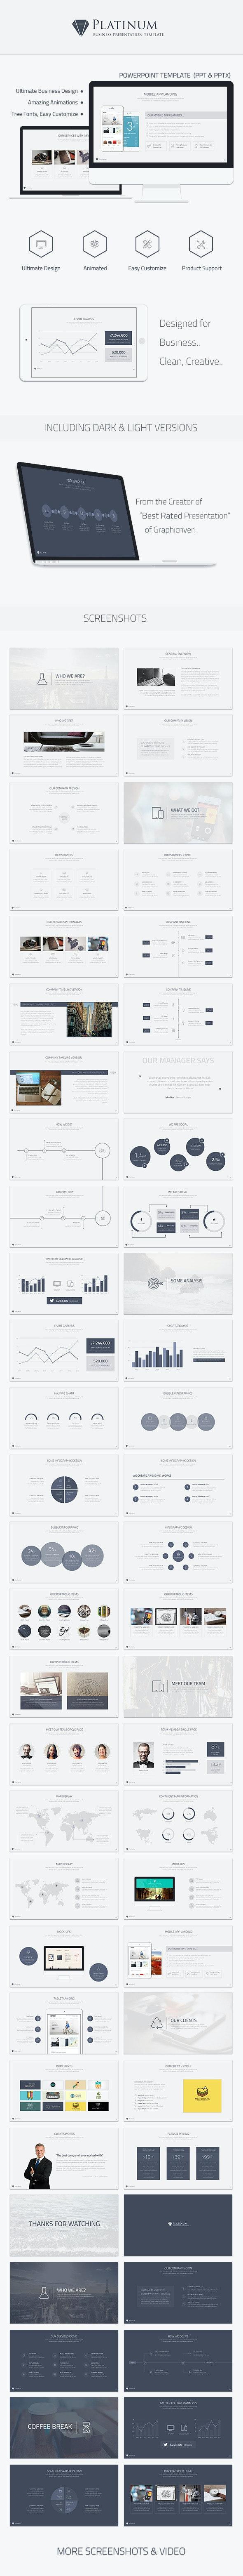 Platinum Business Powerpoint Template - Business PowerPoint Templates